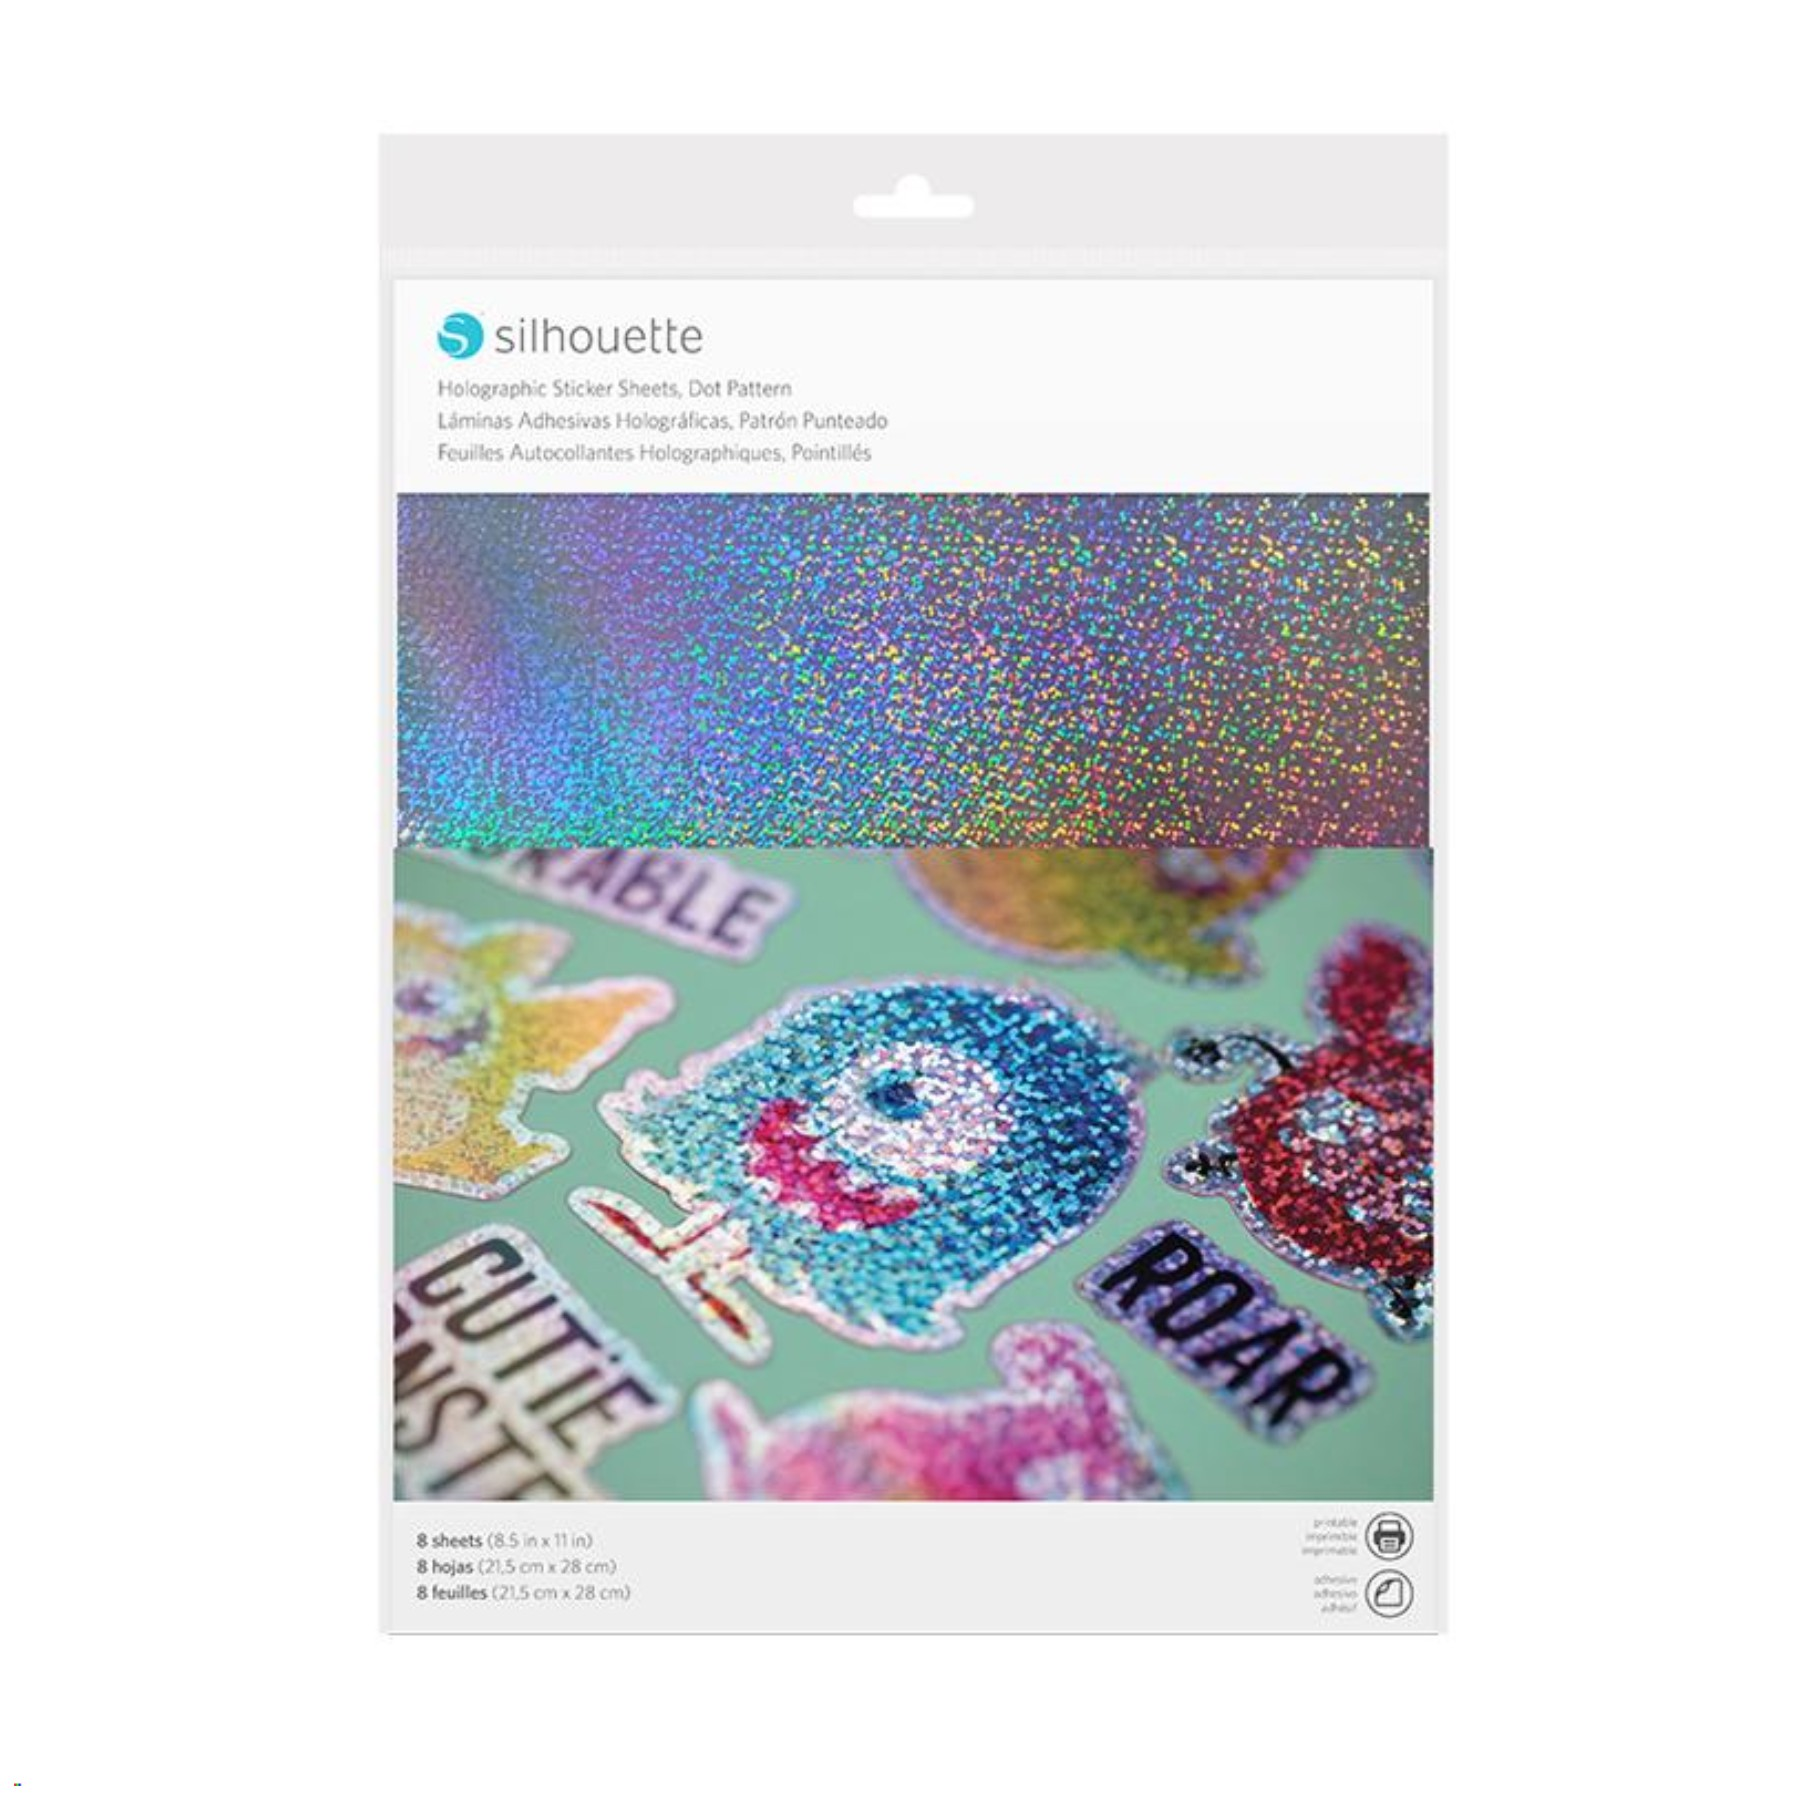 Láminas holográficas adhesivas patrón de puntos